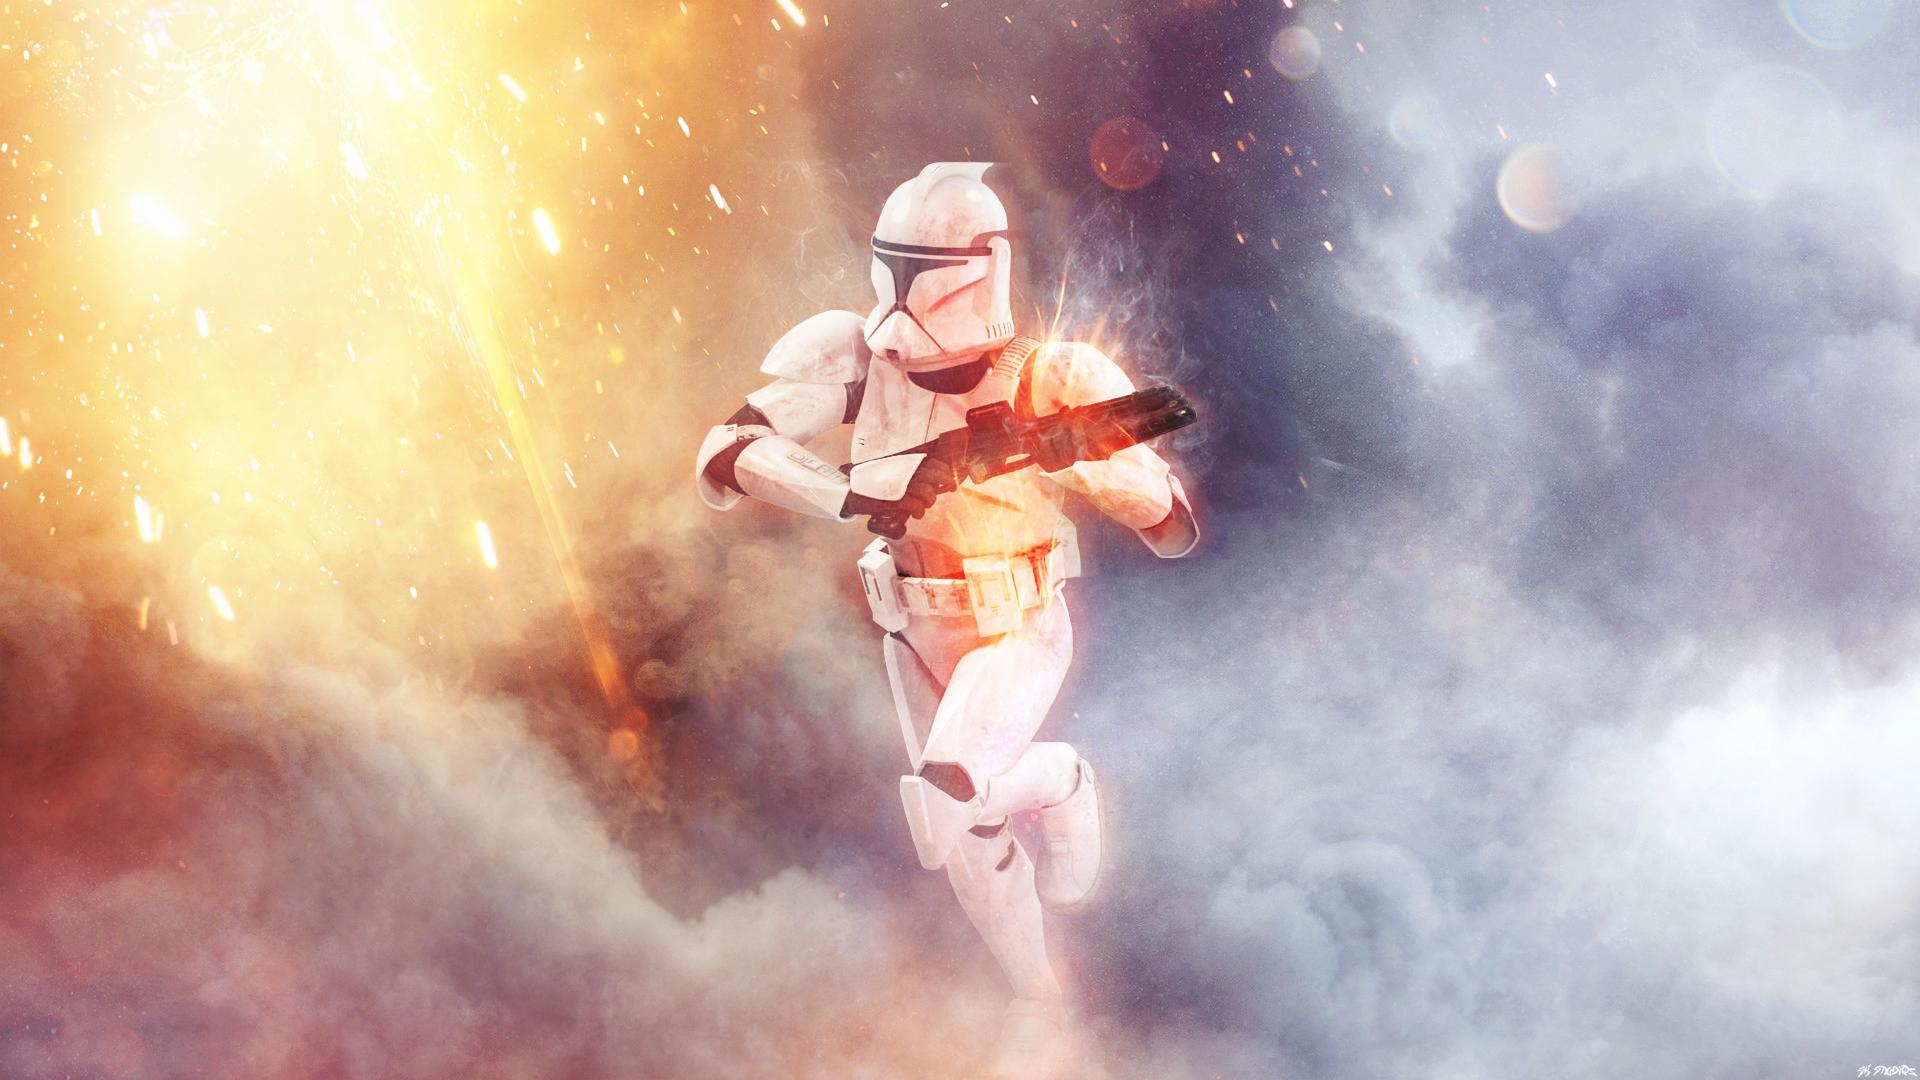 Battlefront 1 Phase 1 Clone Trooper Fondo De Pantalla Hd